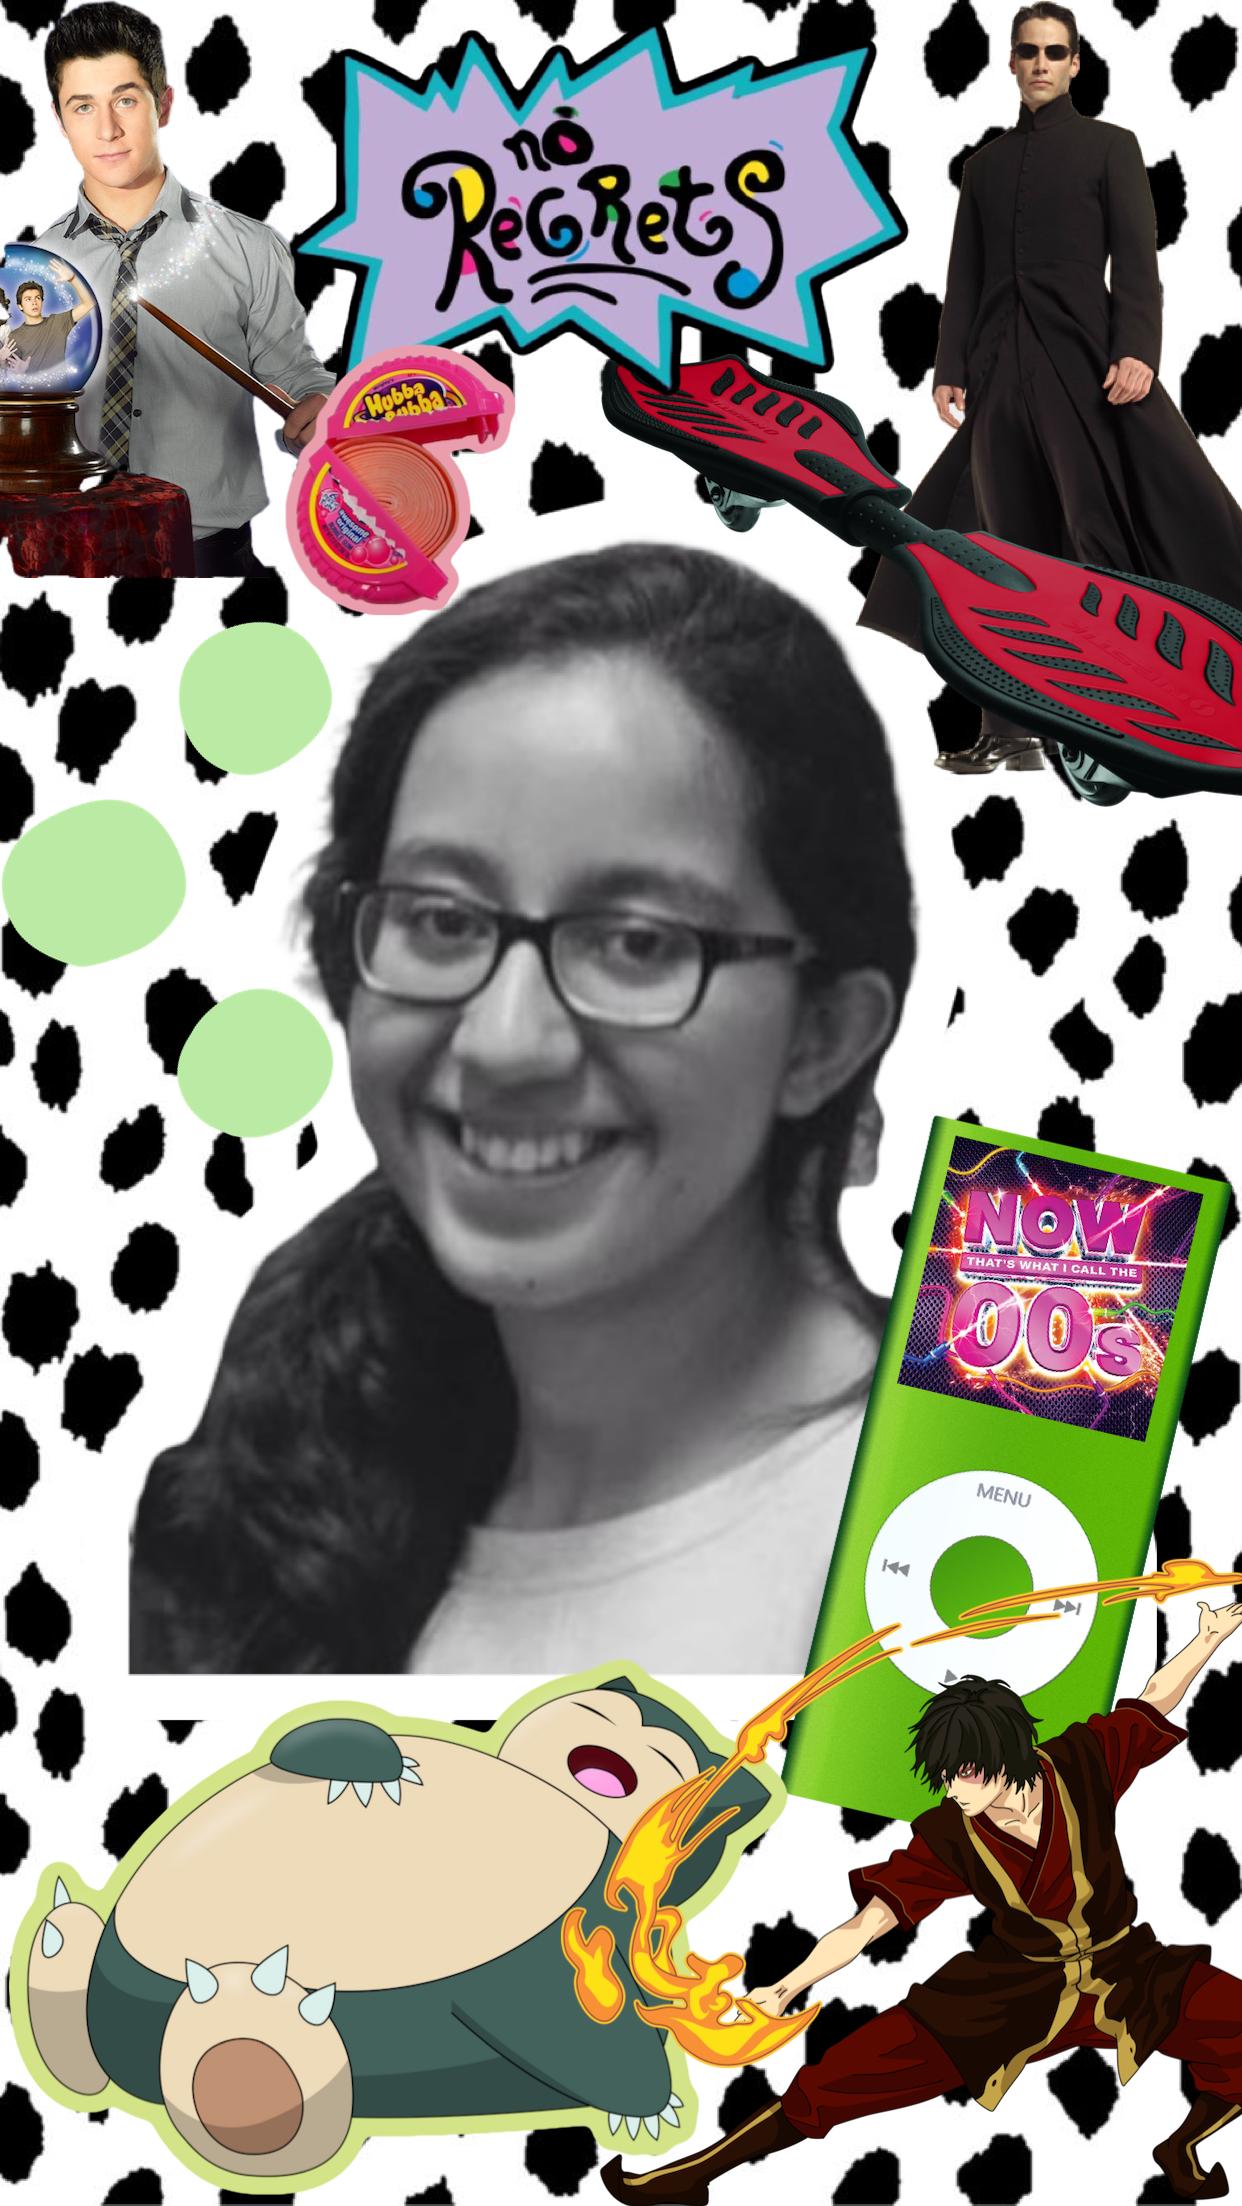 Ojasvani Dahiya, Assistant Editor